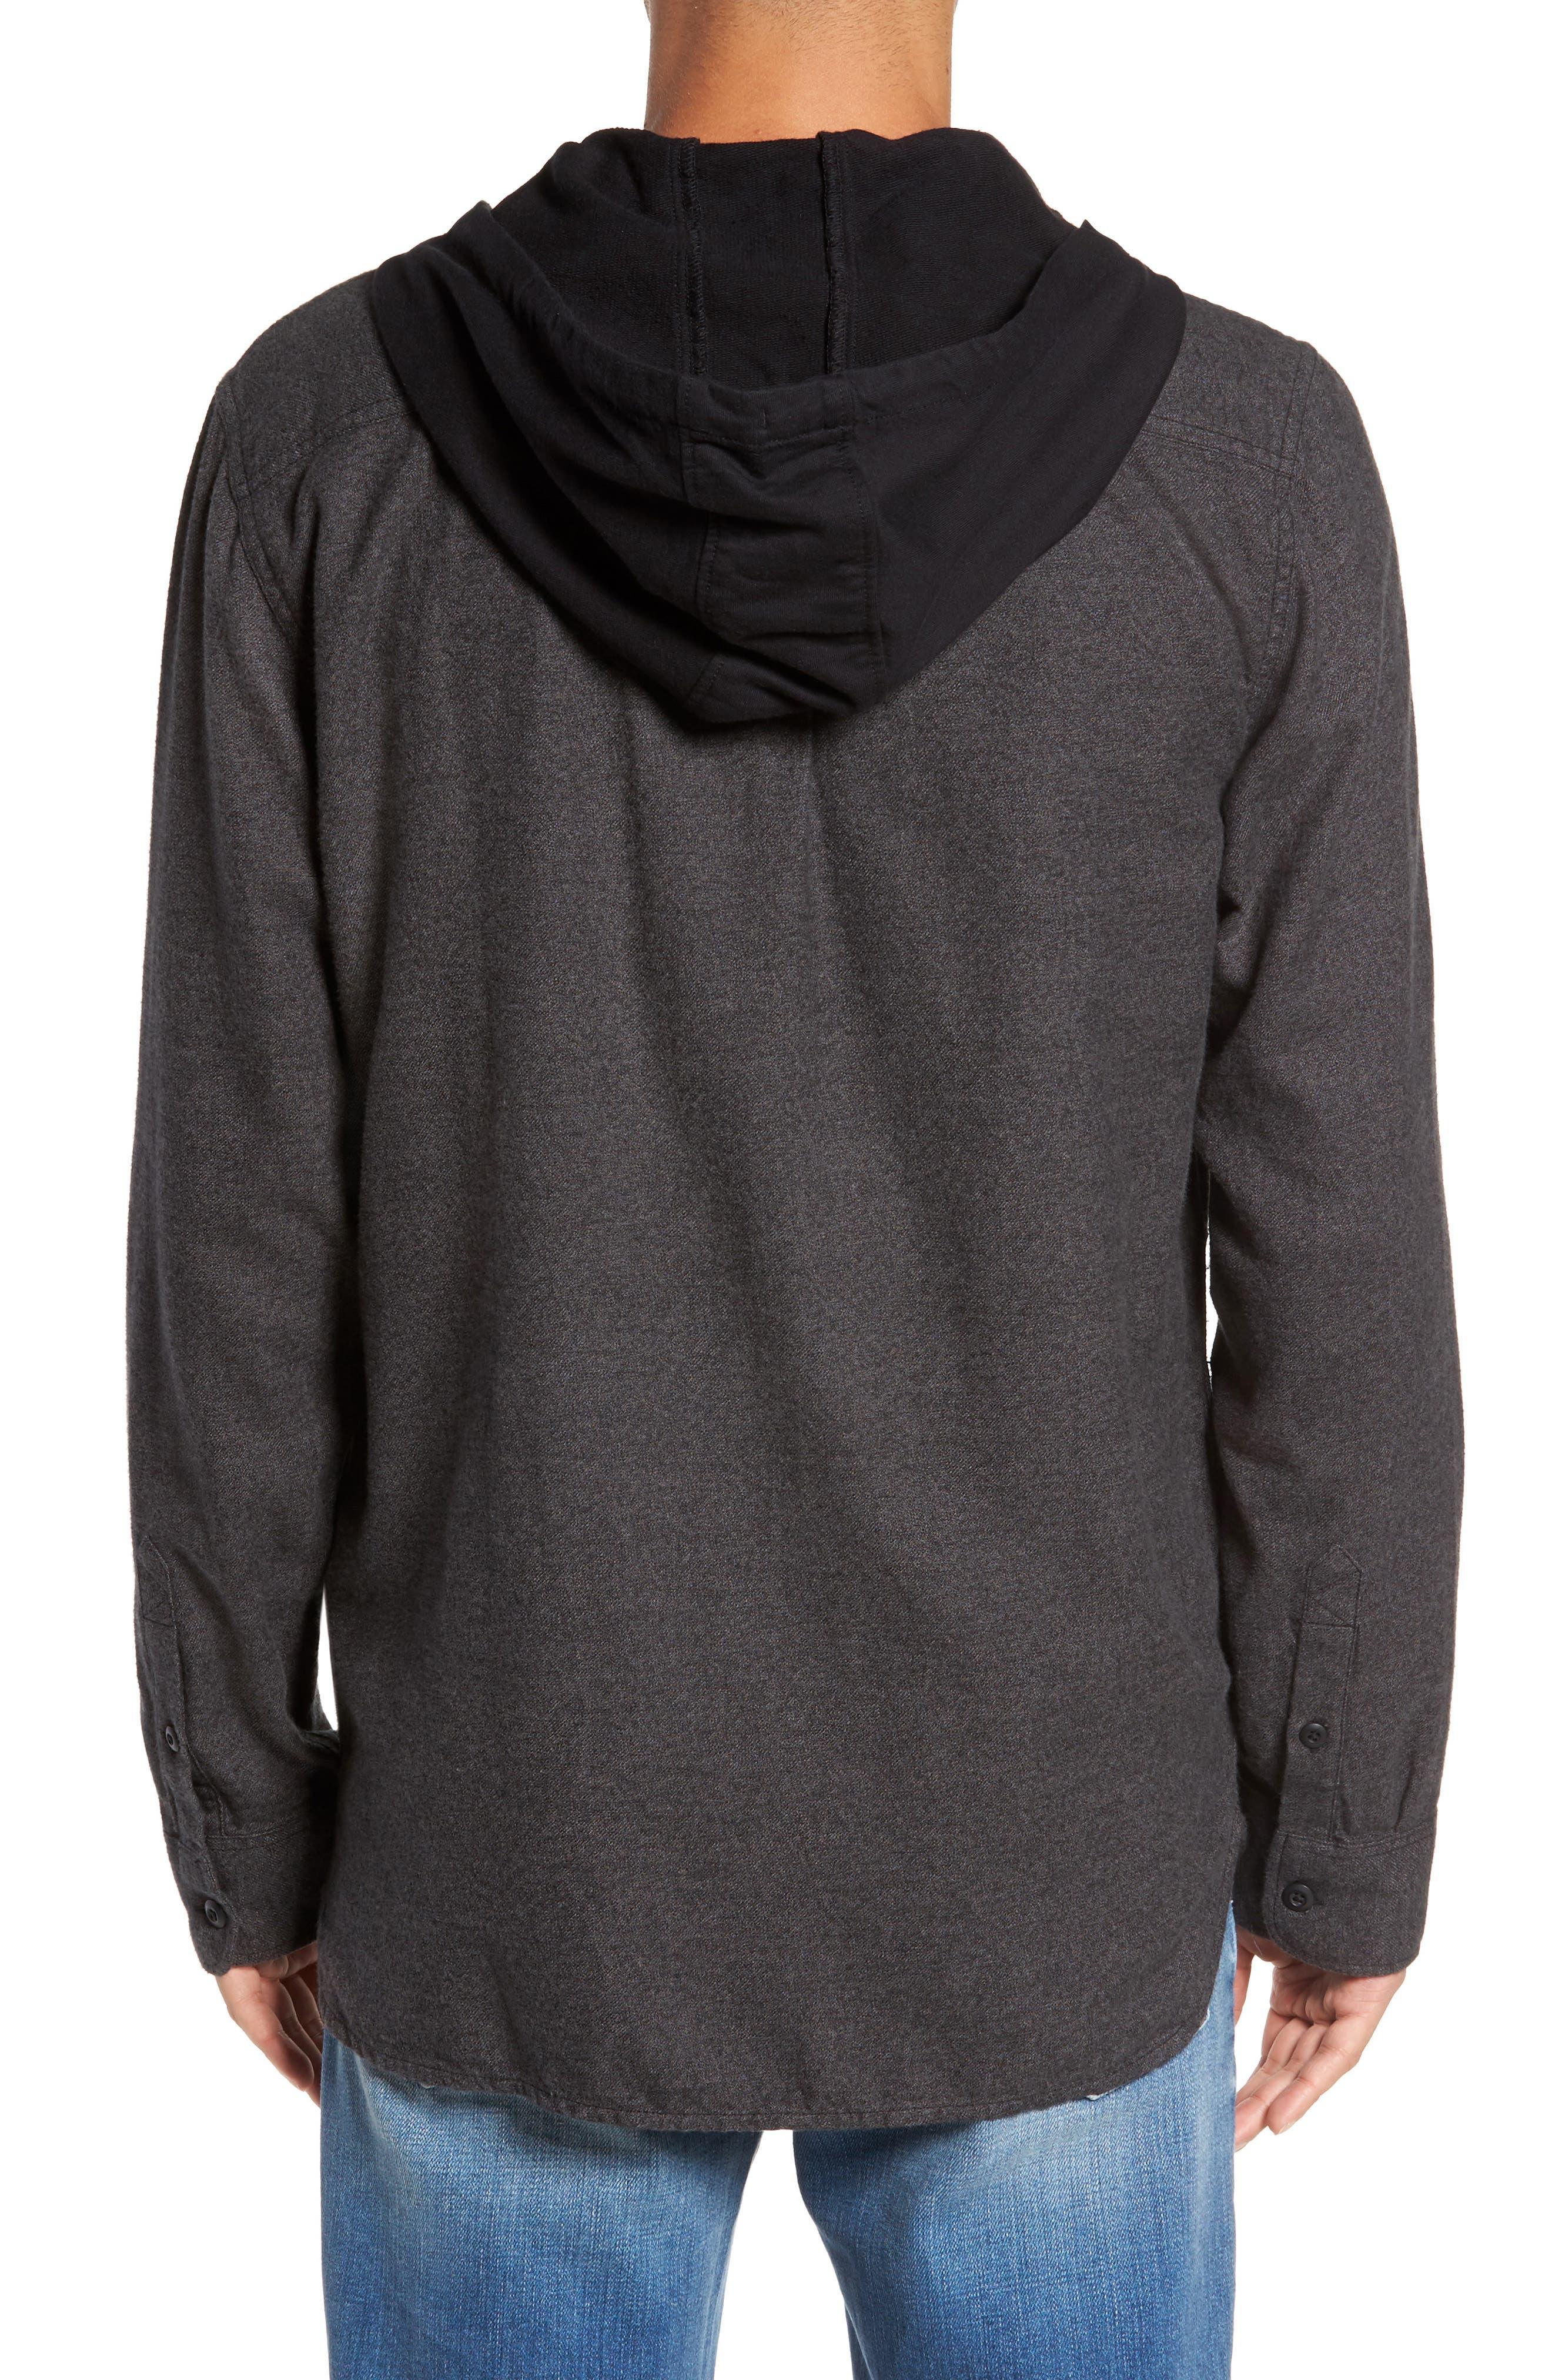 Alternate Image 2  - Vans Never Mind Hooded Zip Shirt Jacket